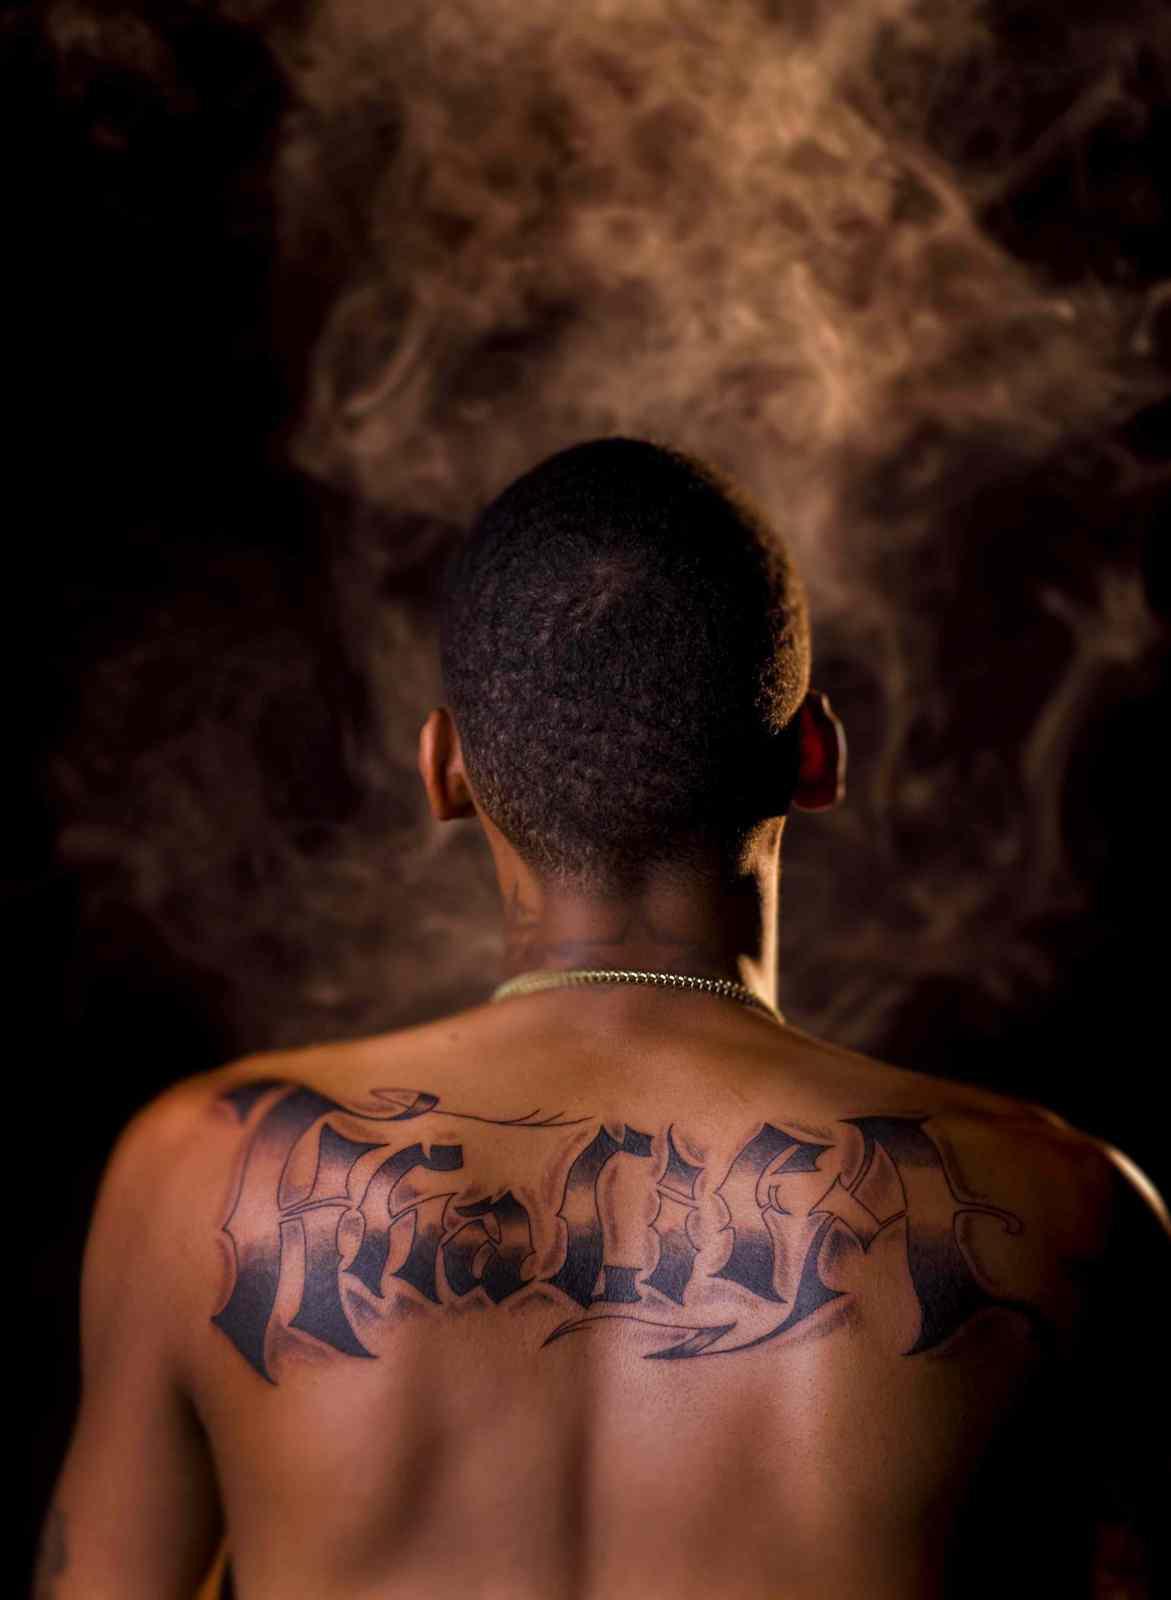 Forrest Tucker Trey Songz Brother moreover 493874 besides Drake Grandmother 3 Peat 3jtAuQv3i6xG further FQSnLx Vegeta Shirt together with Wiz Khalifa Posts Video Of Deelishis Twerking To His Song On Ig. on wiz khalifa